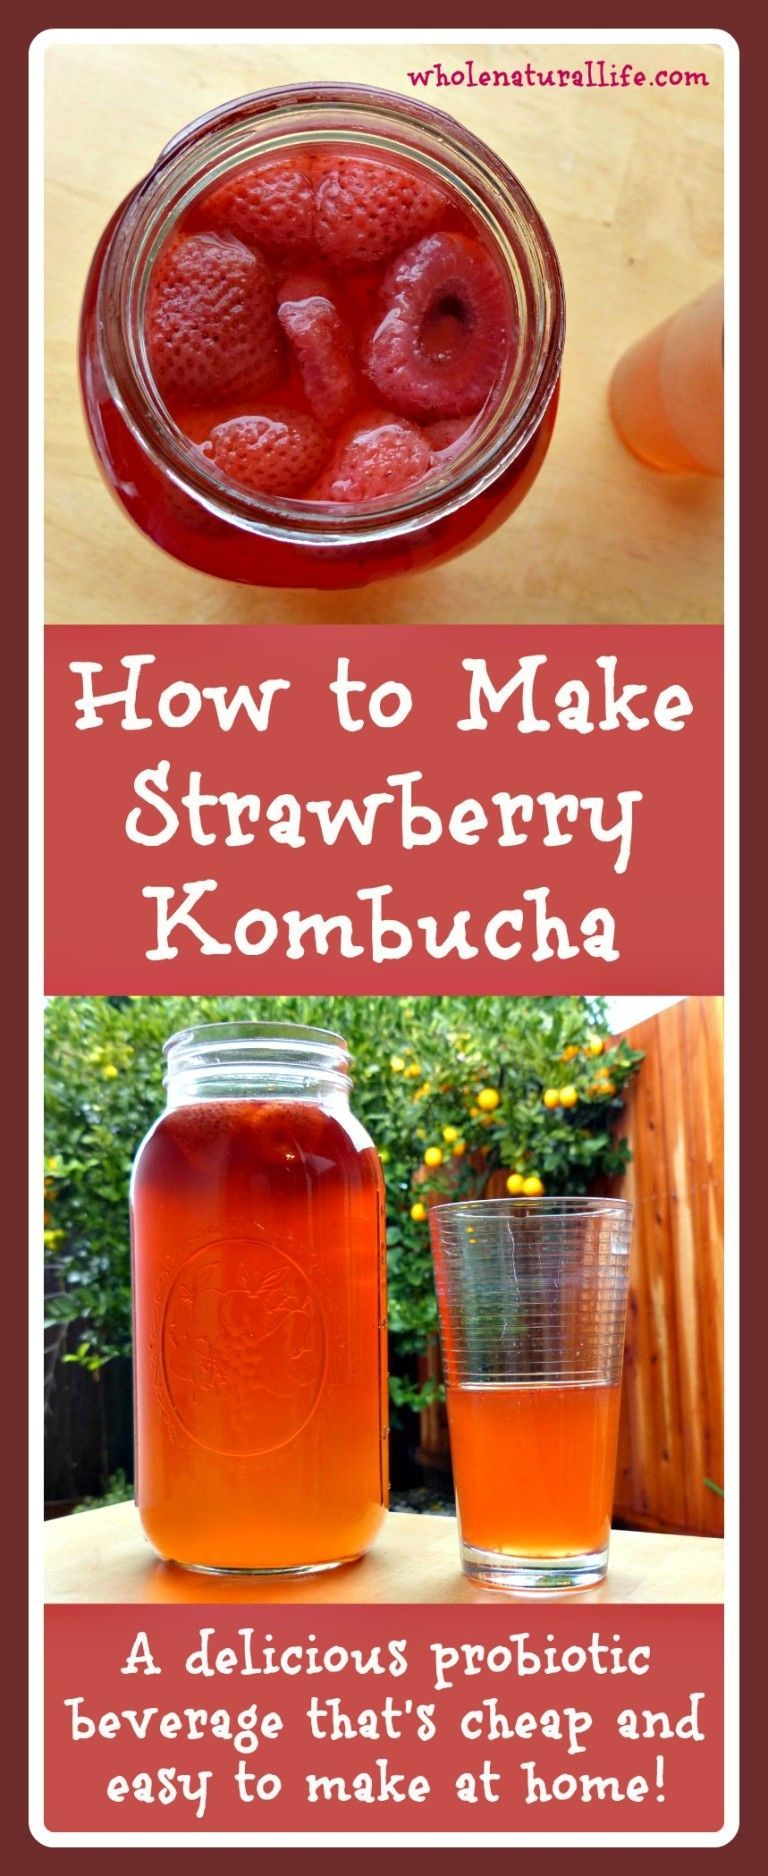 Strawberry Kombucha A Delicious Probiotic Beverage